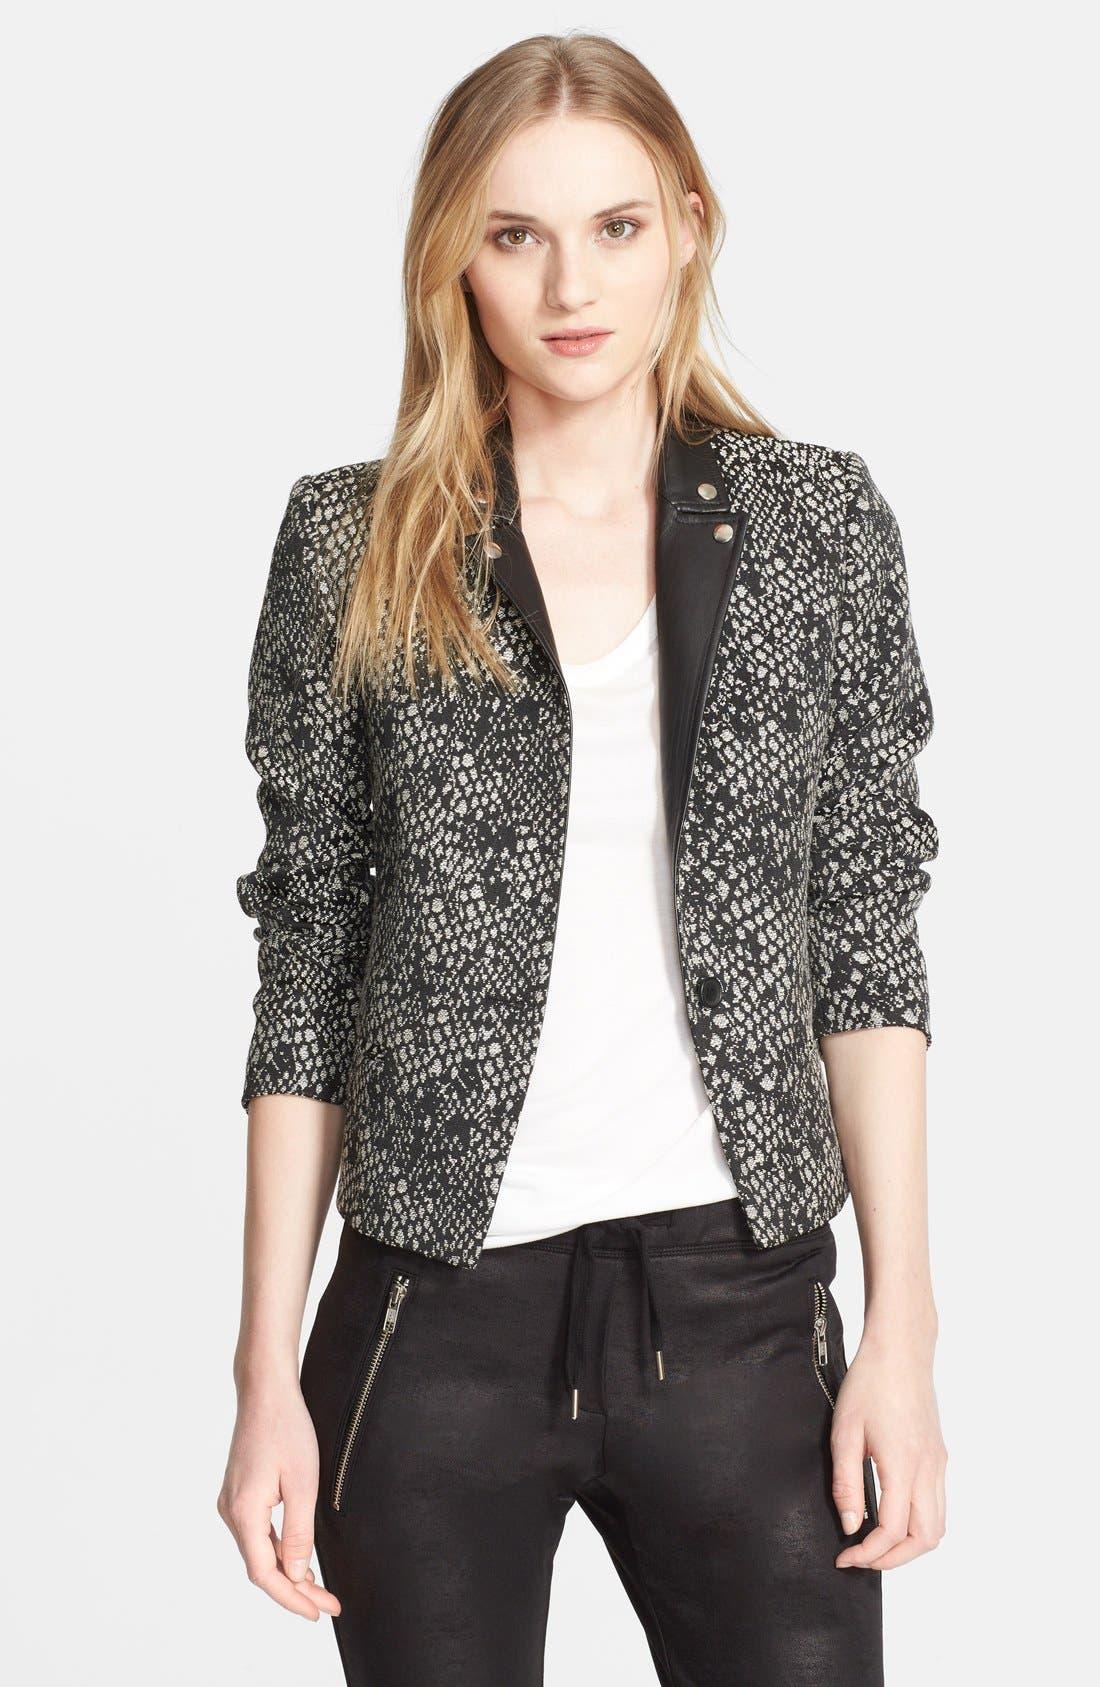 Alternate Image 1 Selected - The Kooples 'Peau de Bête' Leather Trim Jacquard Jacket